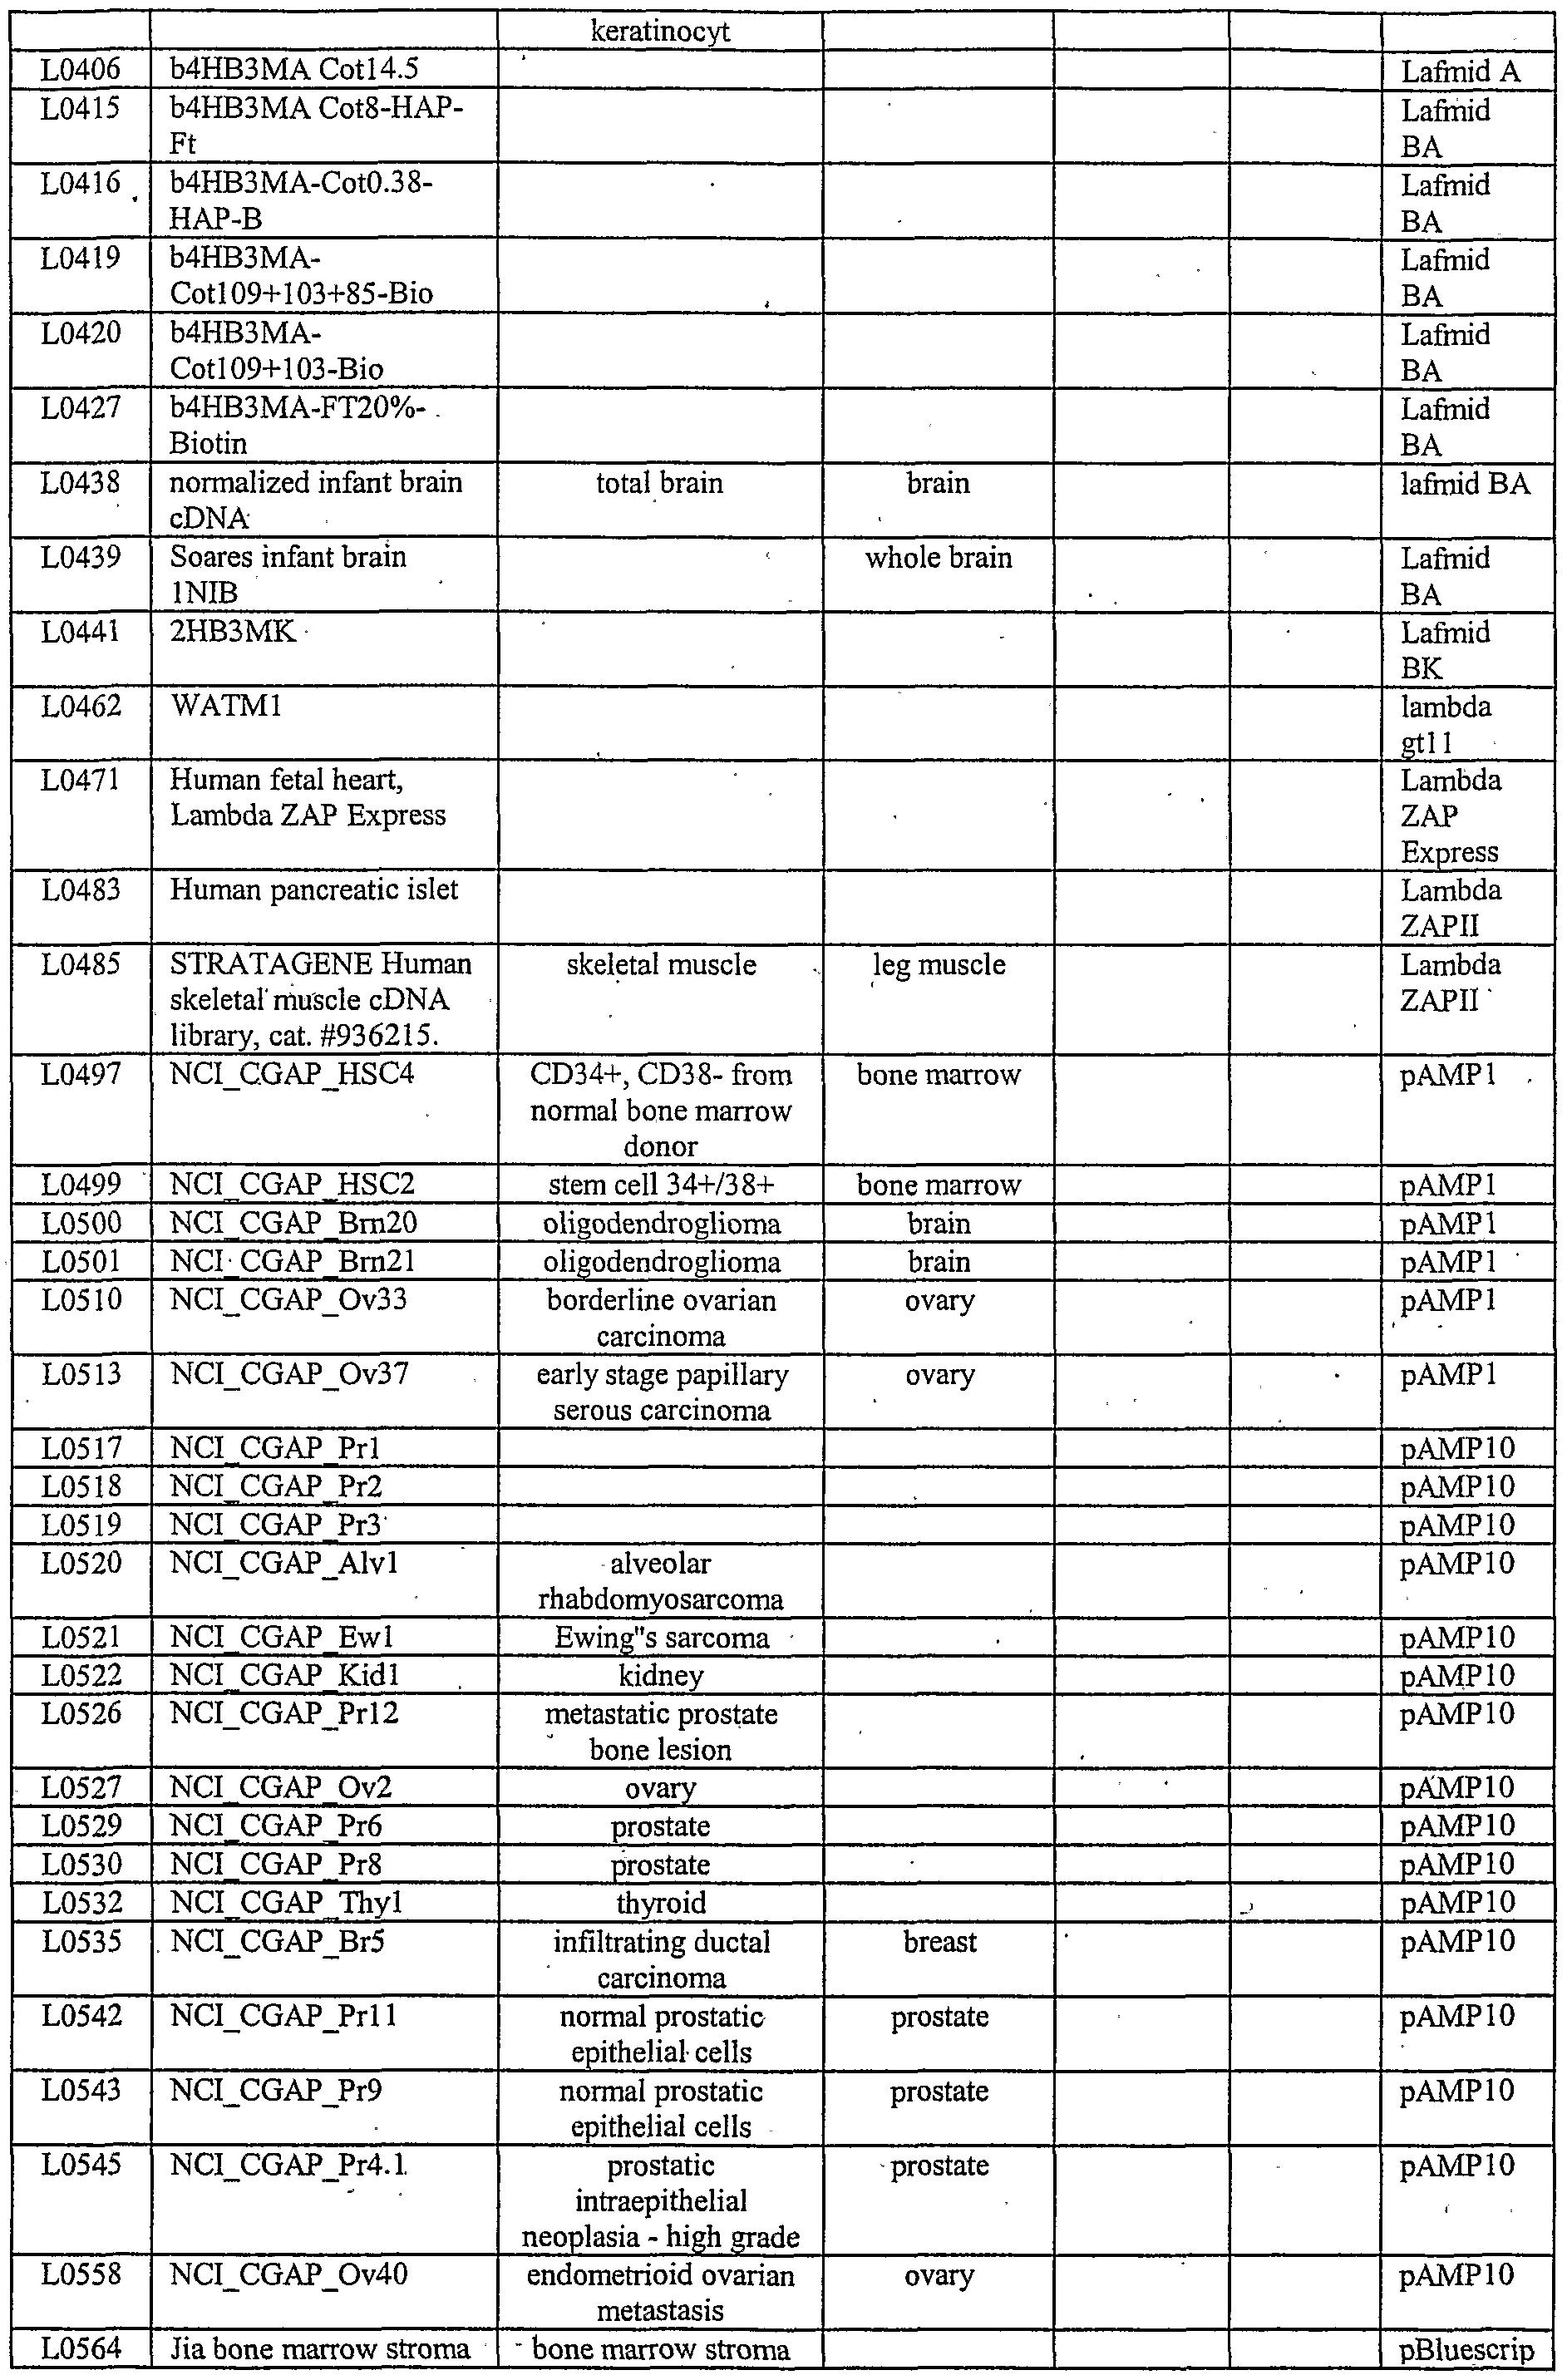 WO2001055328A2 - Nucleic acids 22af81fffca0